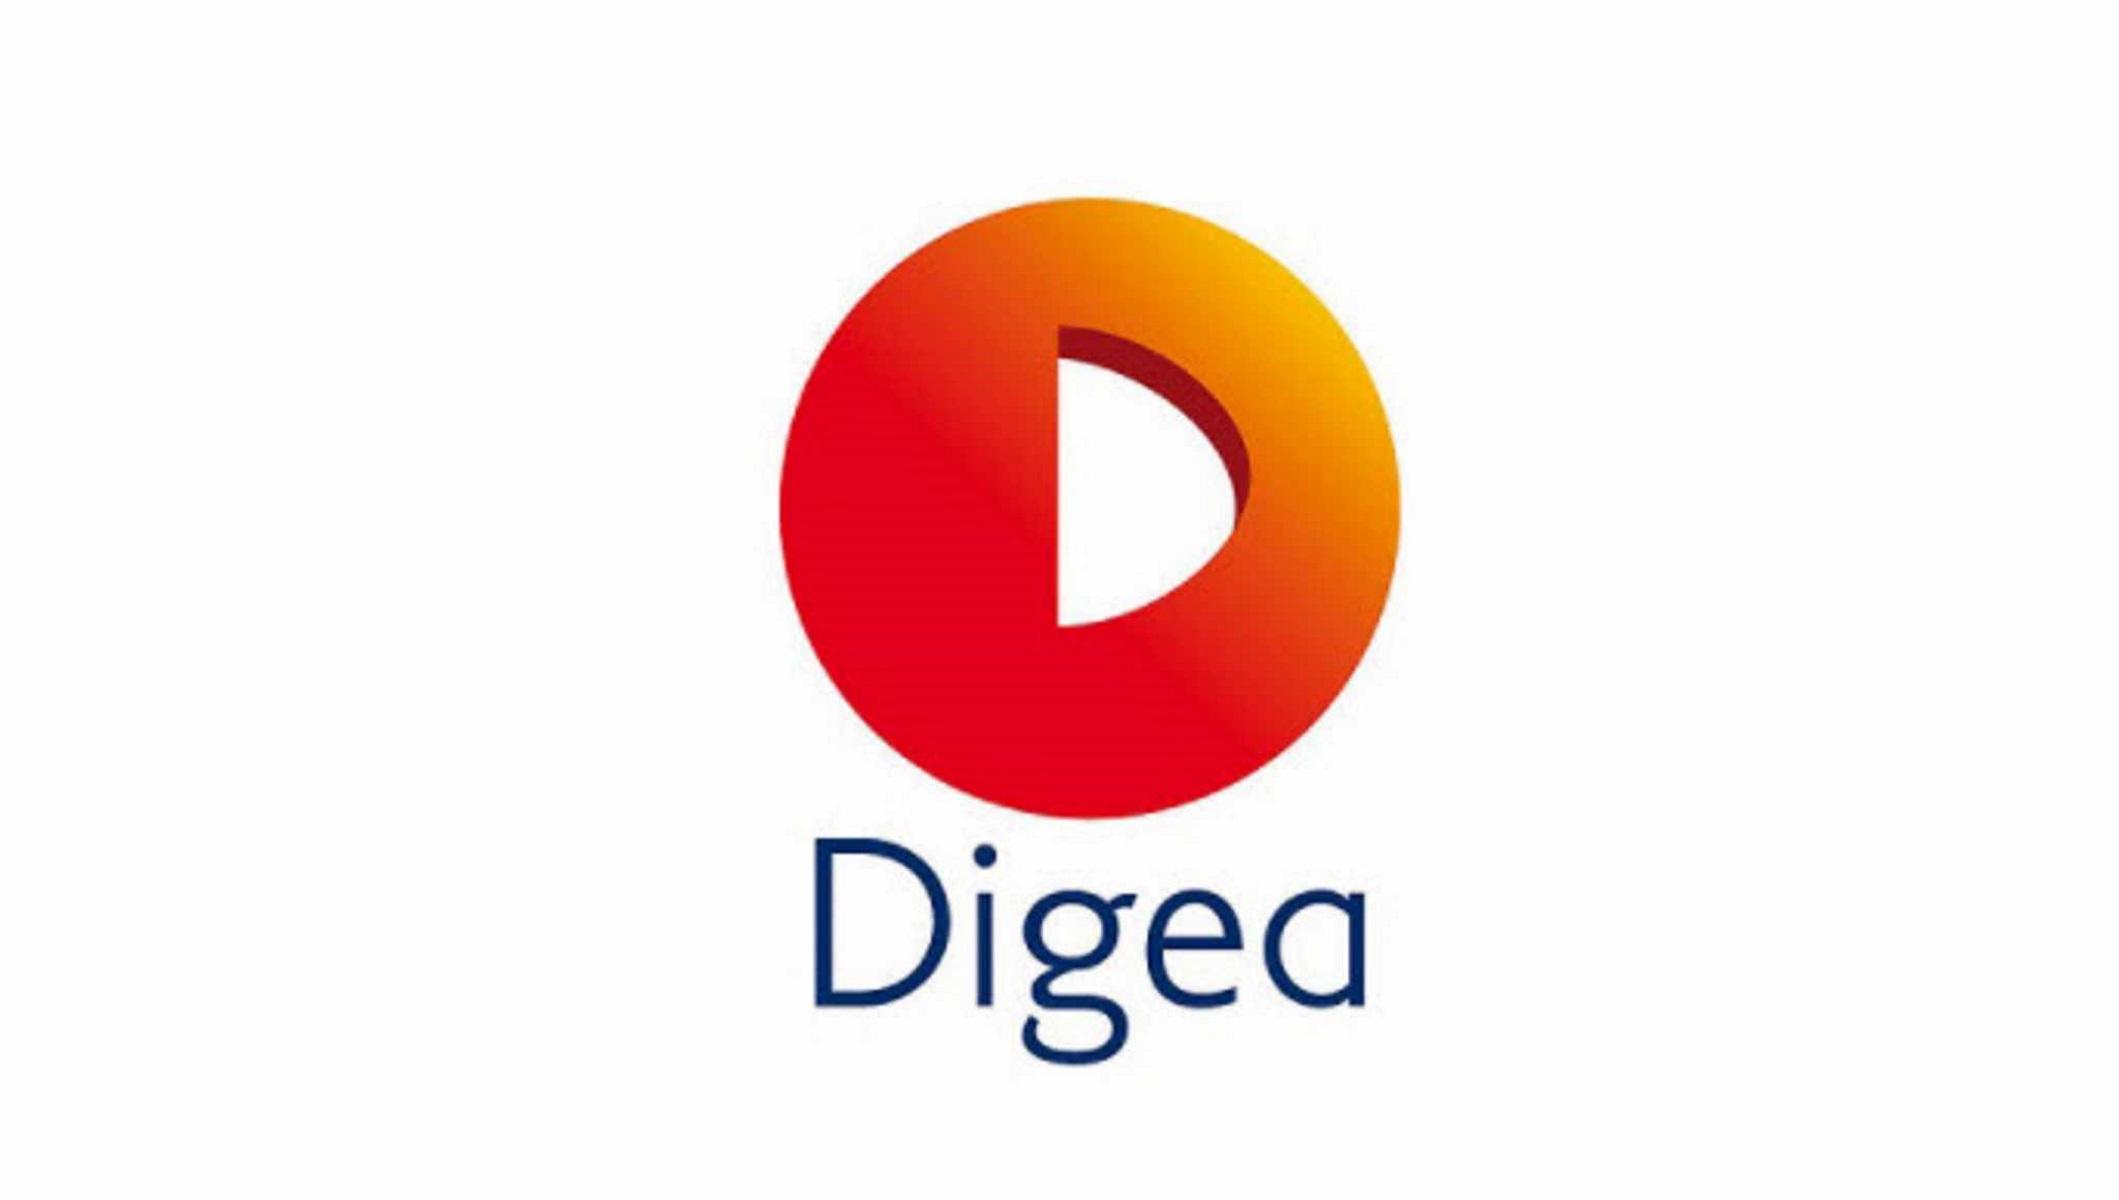 DIGEA: Στη δεύτερη ψηφιακή μετάβαση Αττική και Νότια Εύβοια – Τι πρέπει να κάνουν οι κάτοικοι